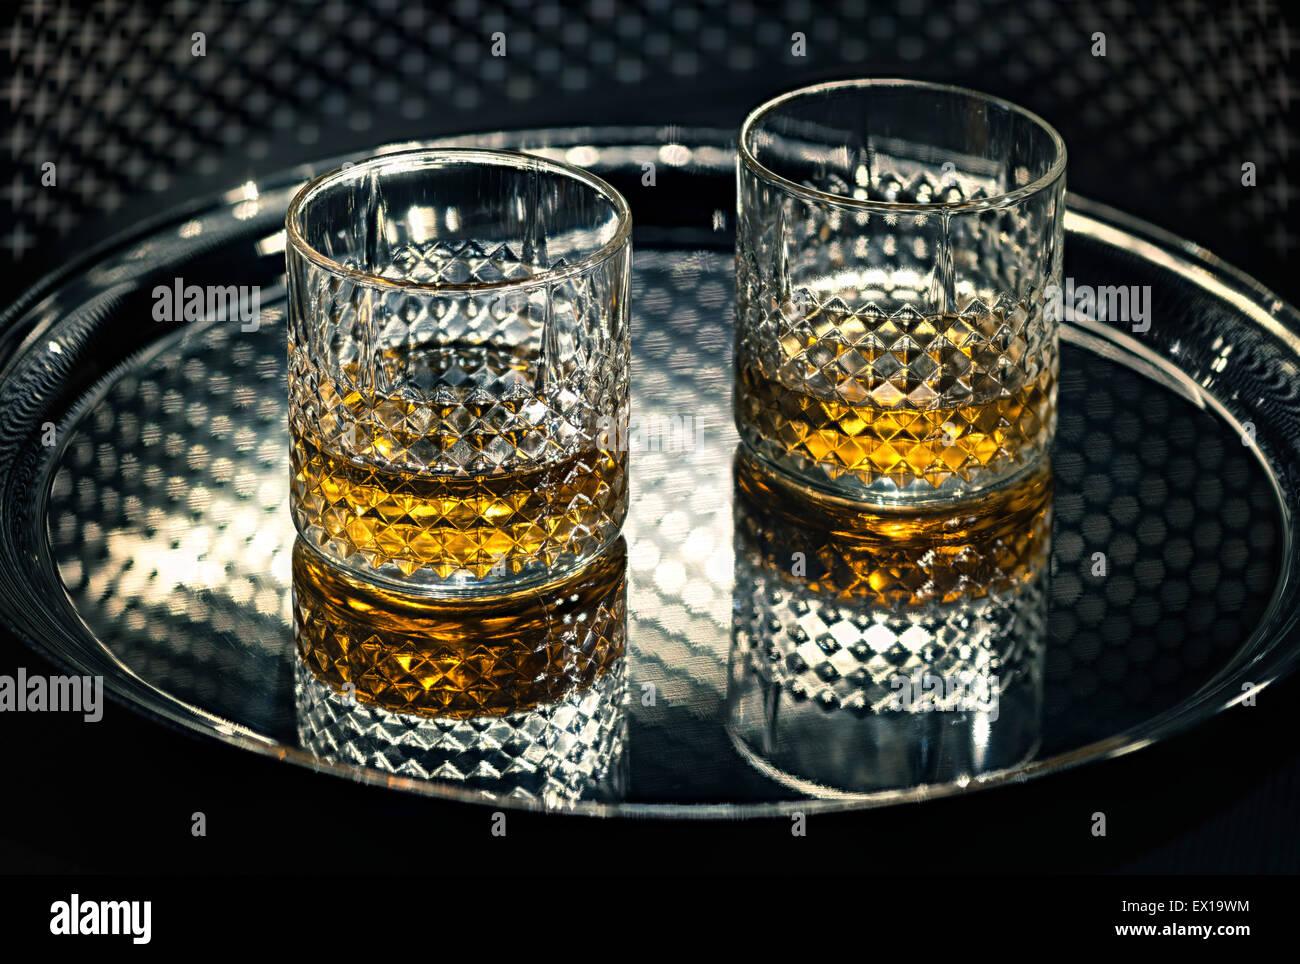 Whiskey vasos en la bandeja. Imagen De Stock